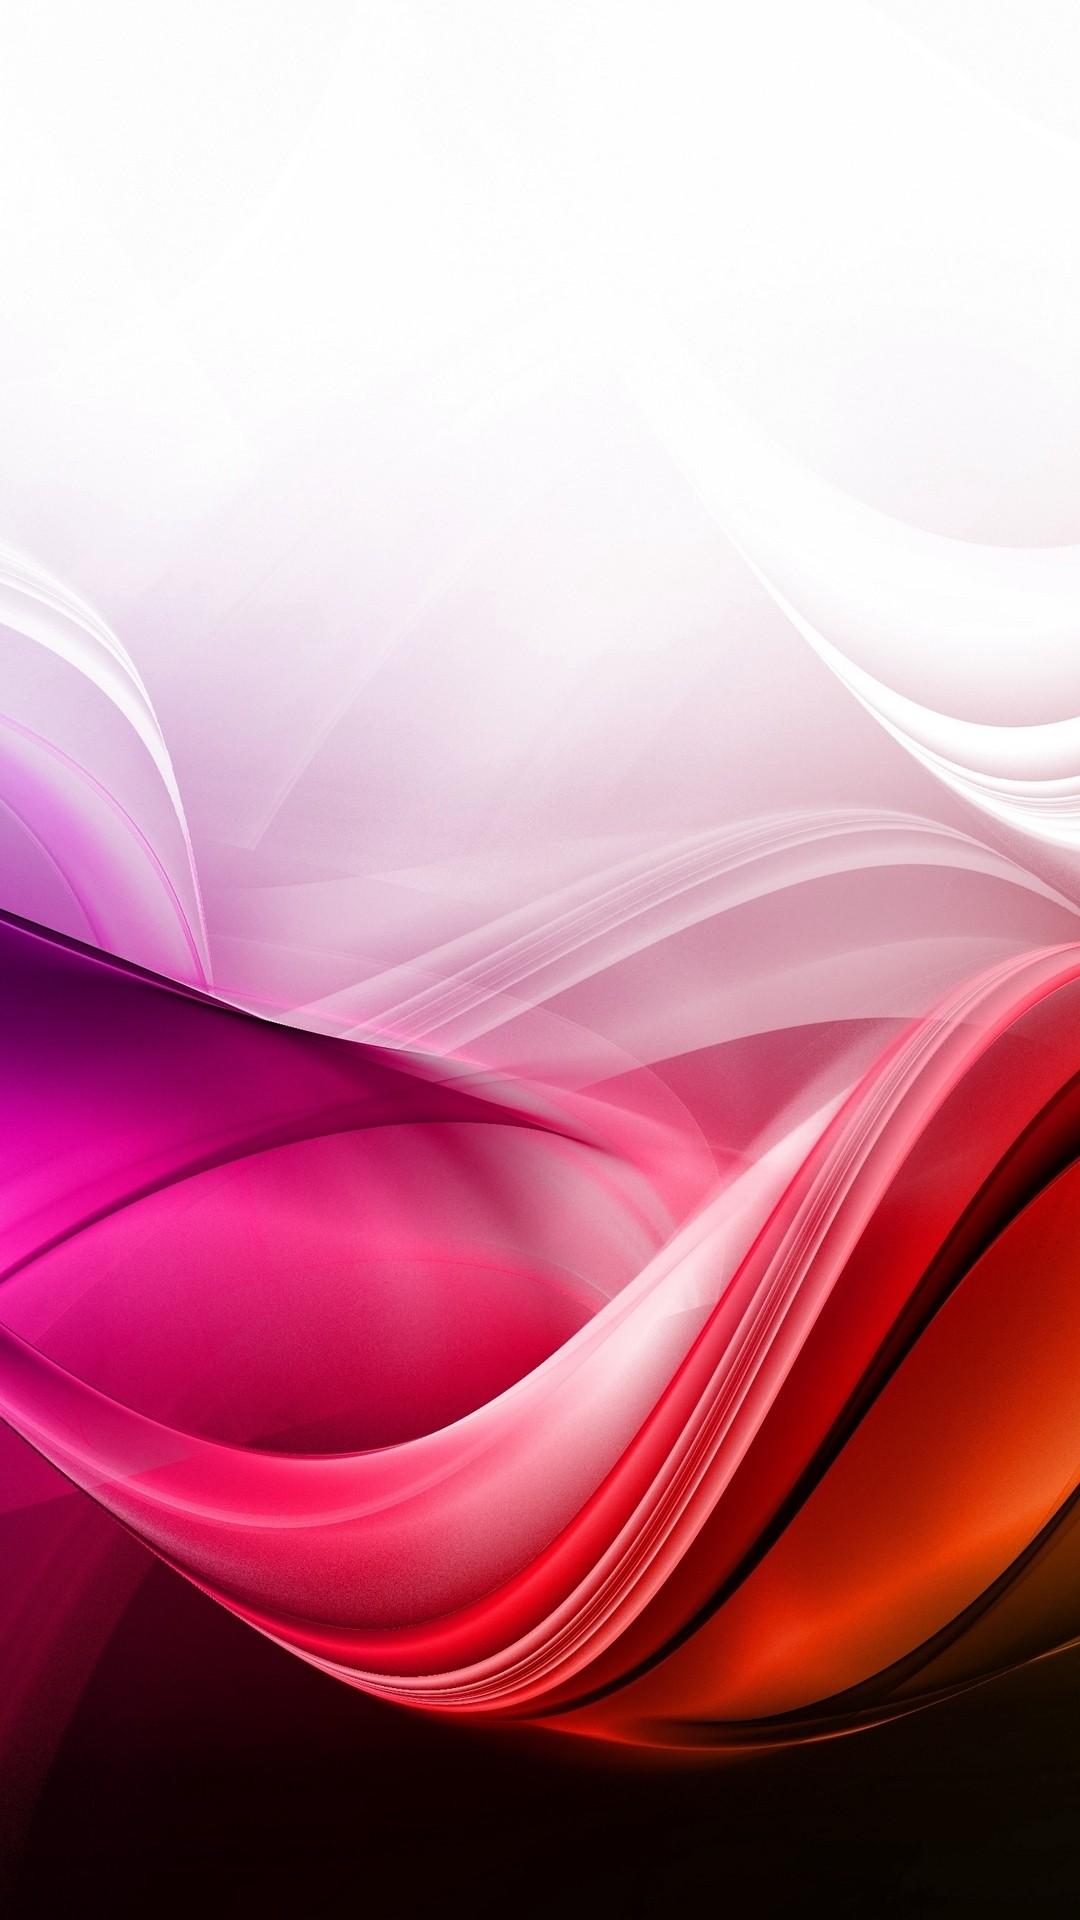 Vector iPhone hd wallpaper